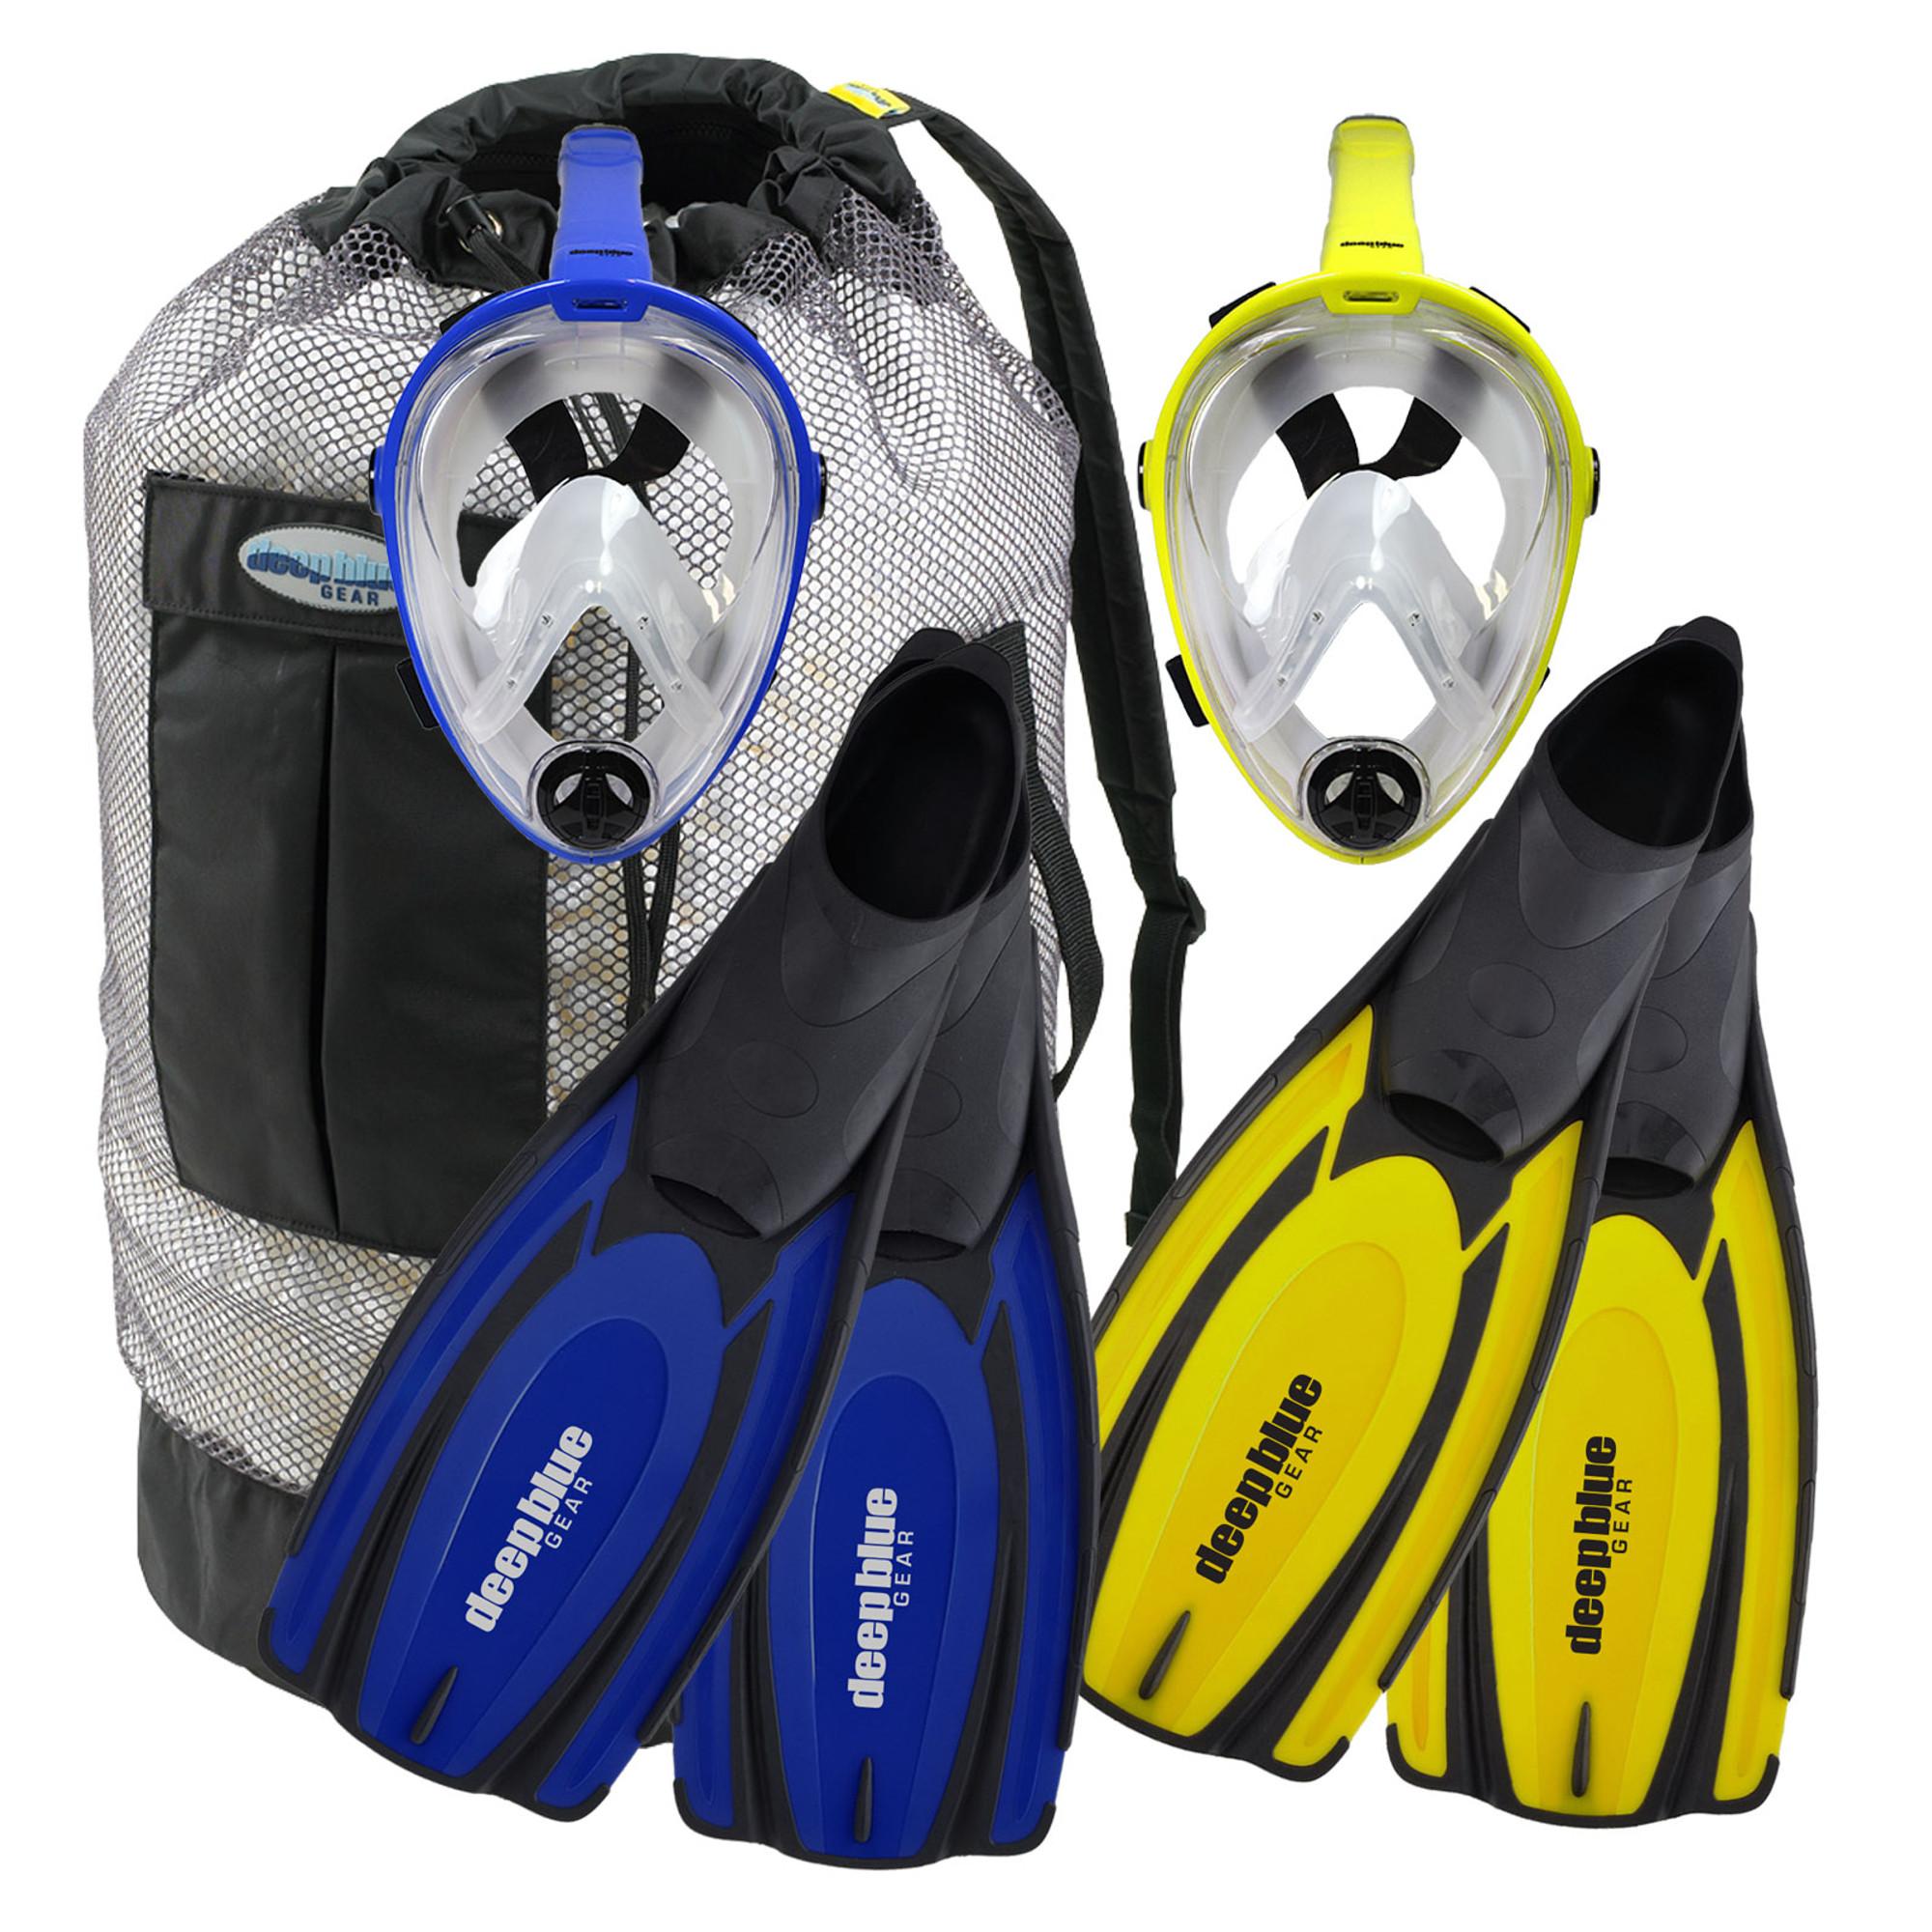 Buddy Full Face Mask - Adult Snorkeling Set